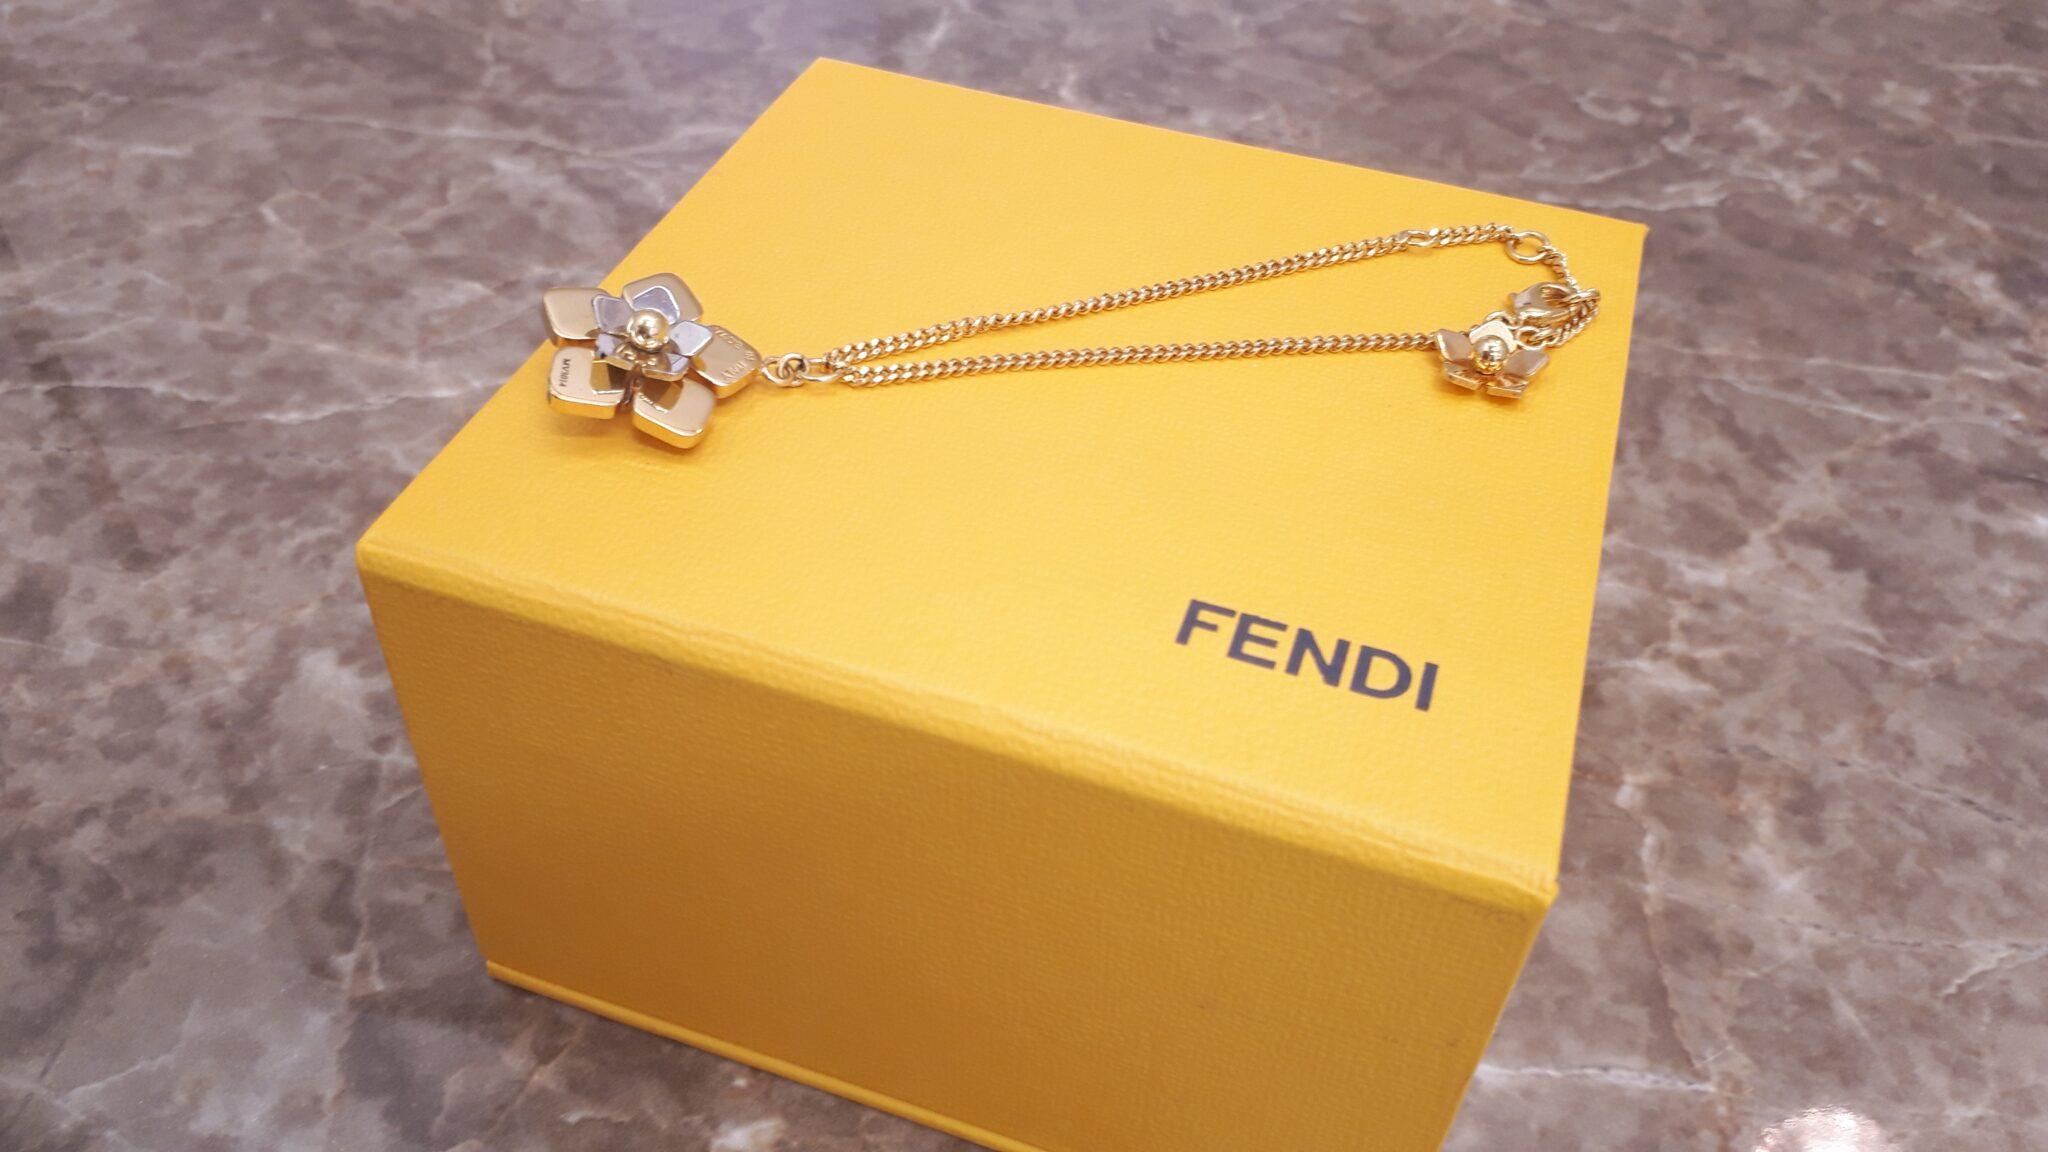 【FENDI フェンディ フラワーブレスレット MV3014】を盛岡市のお客様よりお買取させていただきました!